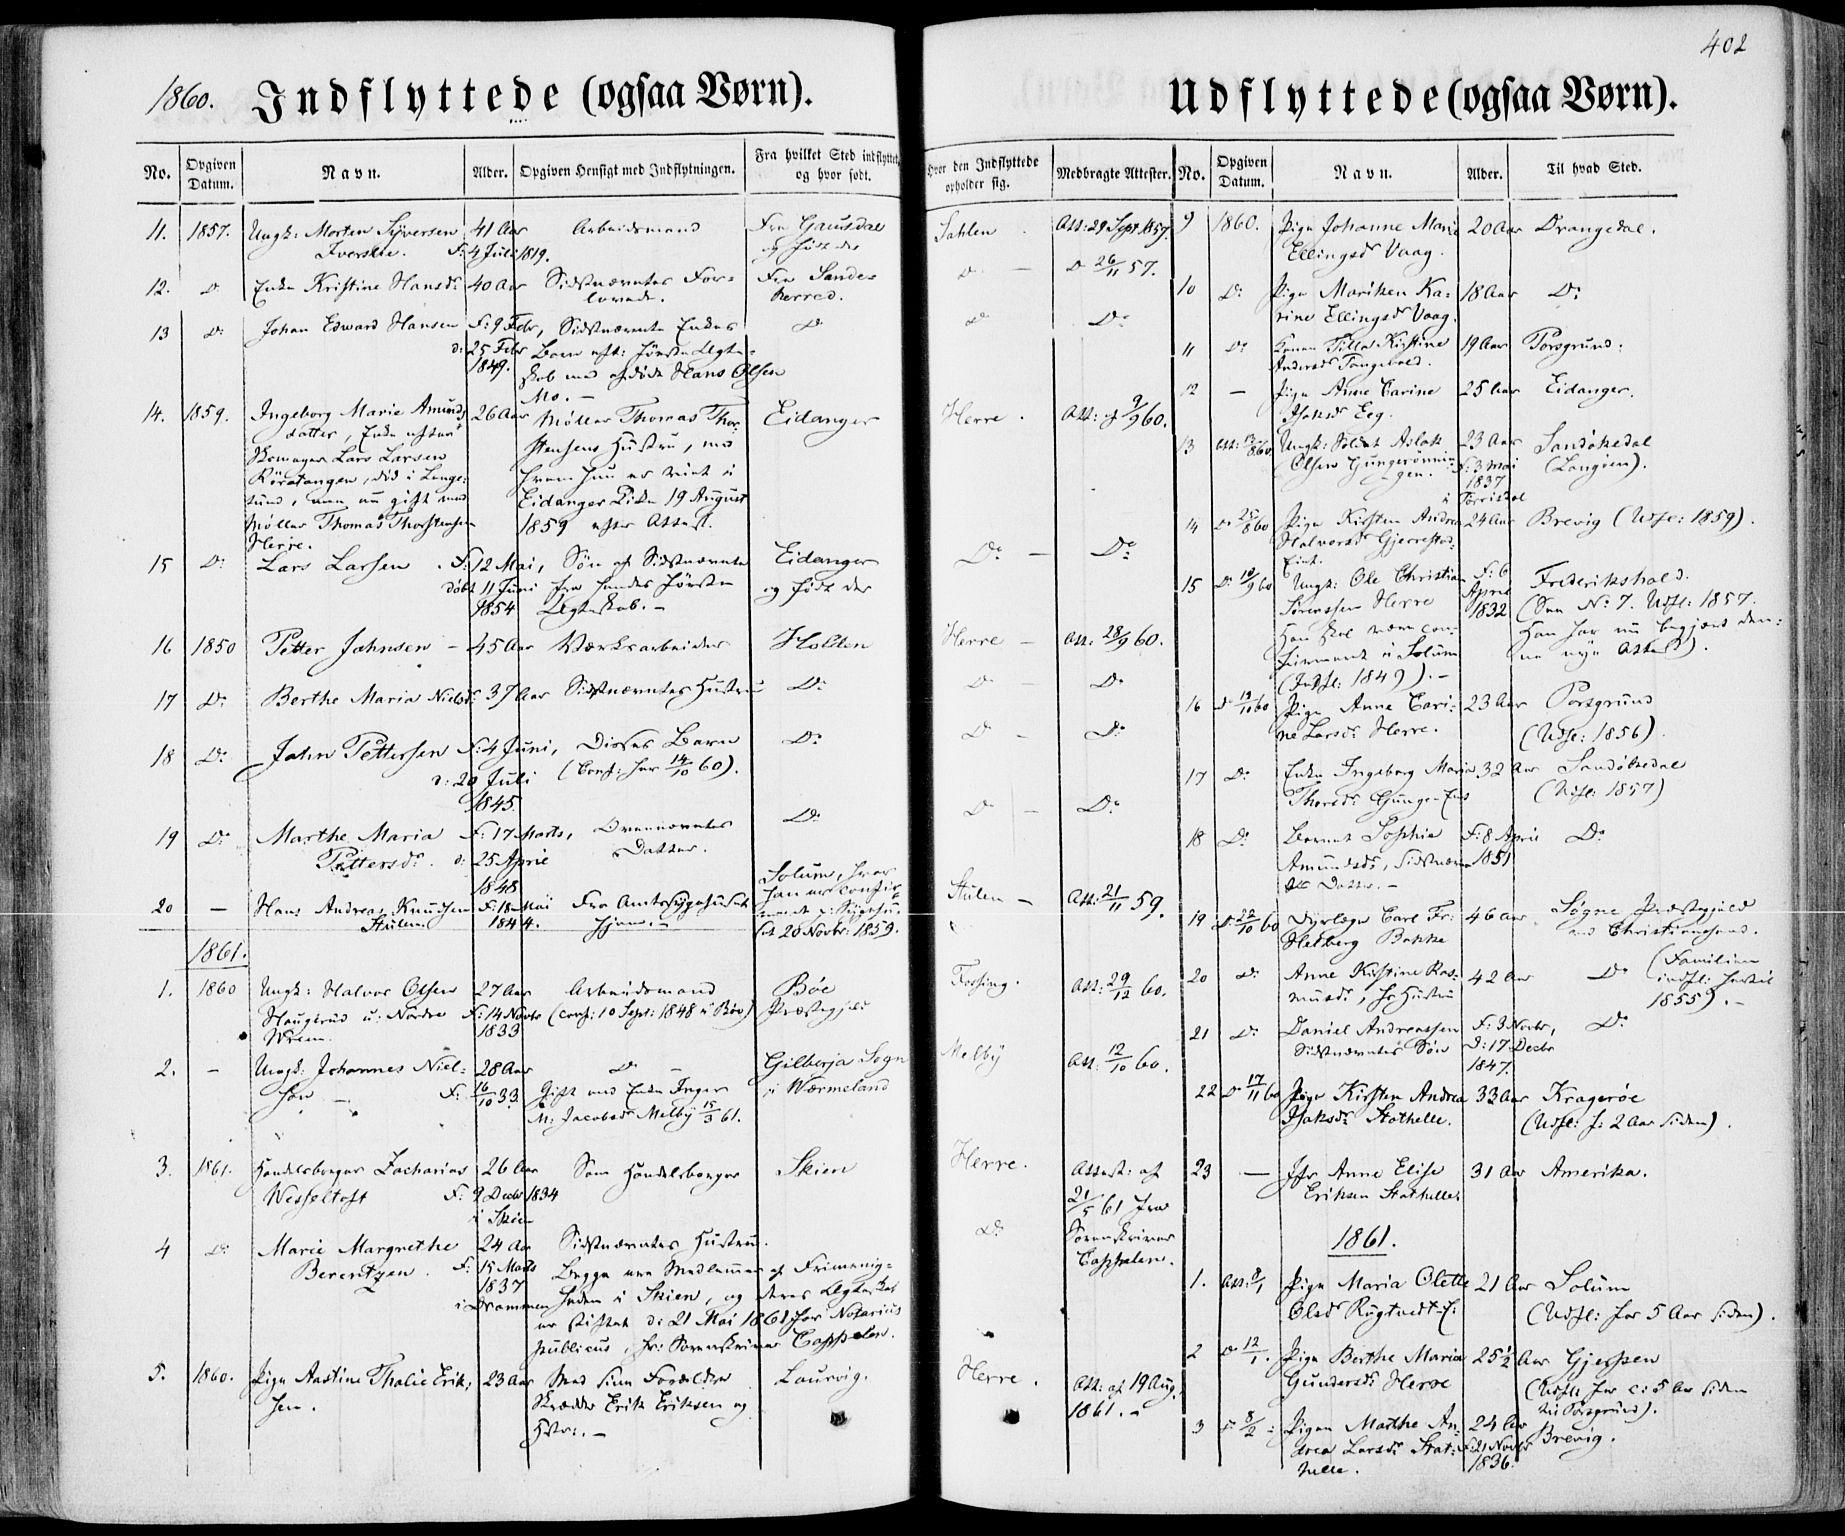 SAKO, Bamble kirkebøker, F/Fa/L0005: Ministerialbok nr. I 5, 1854-1869, s. 402